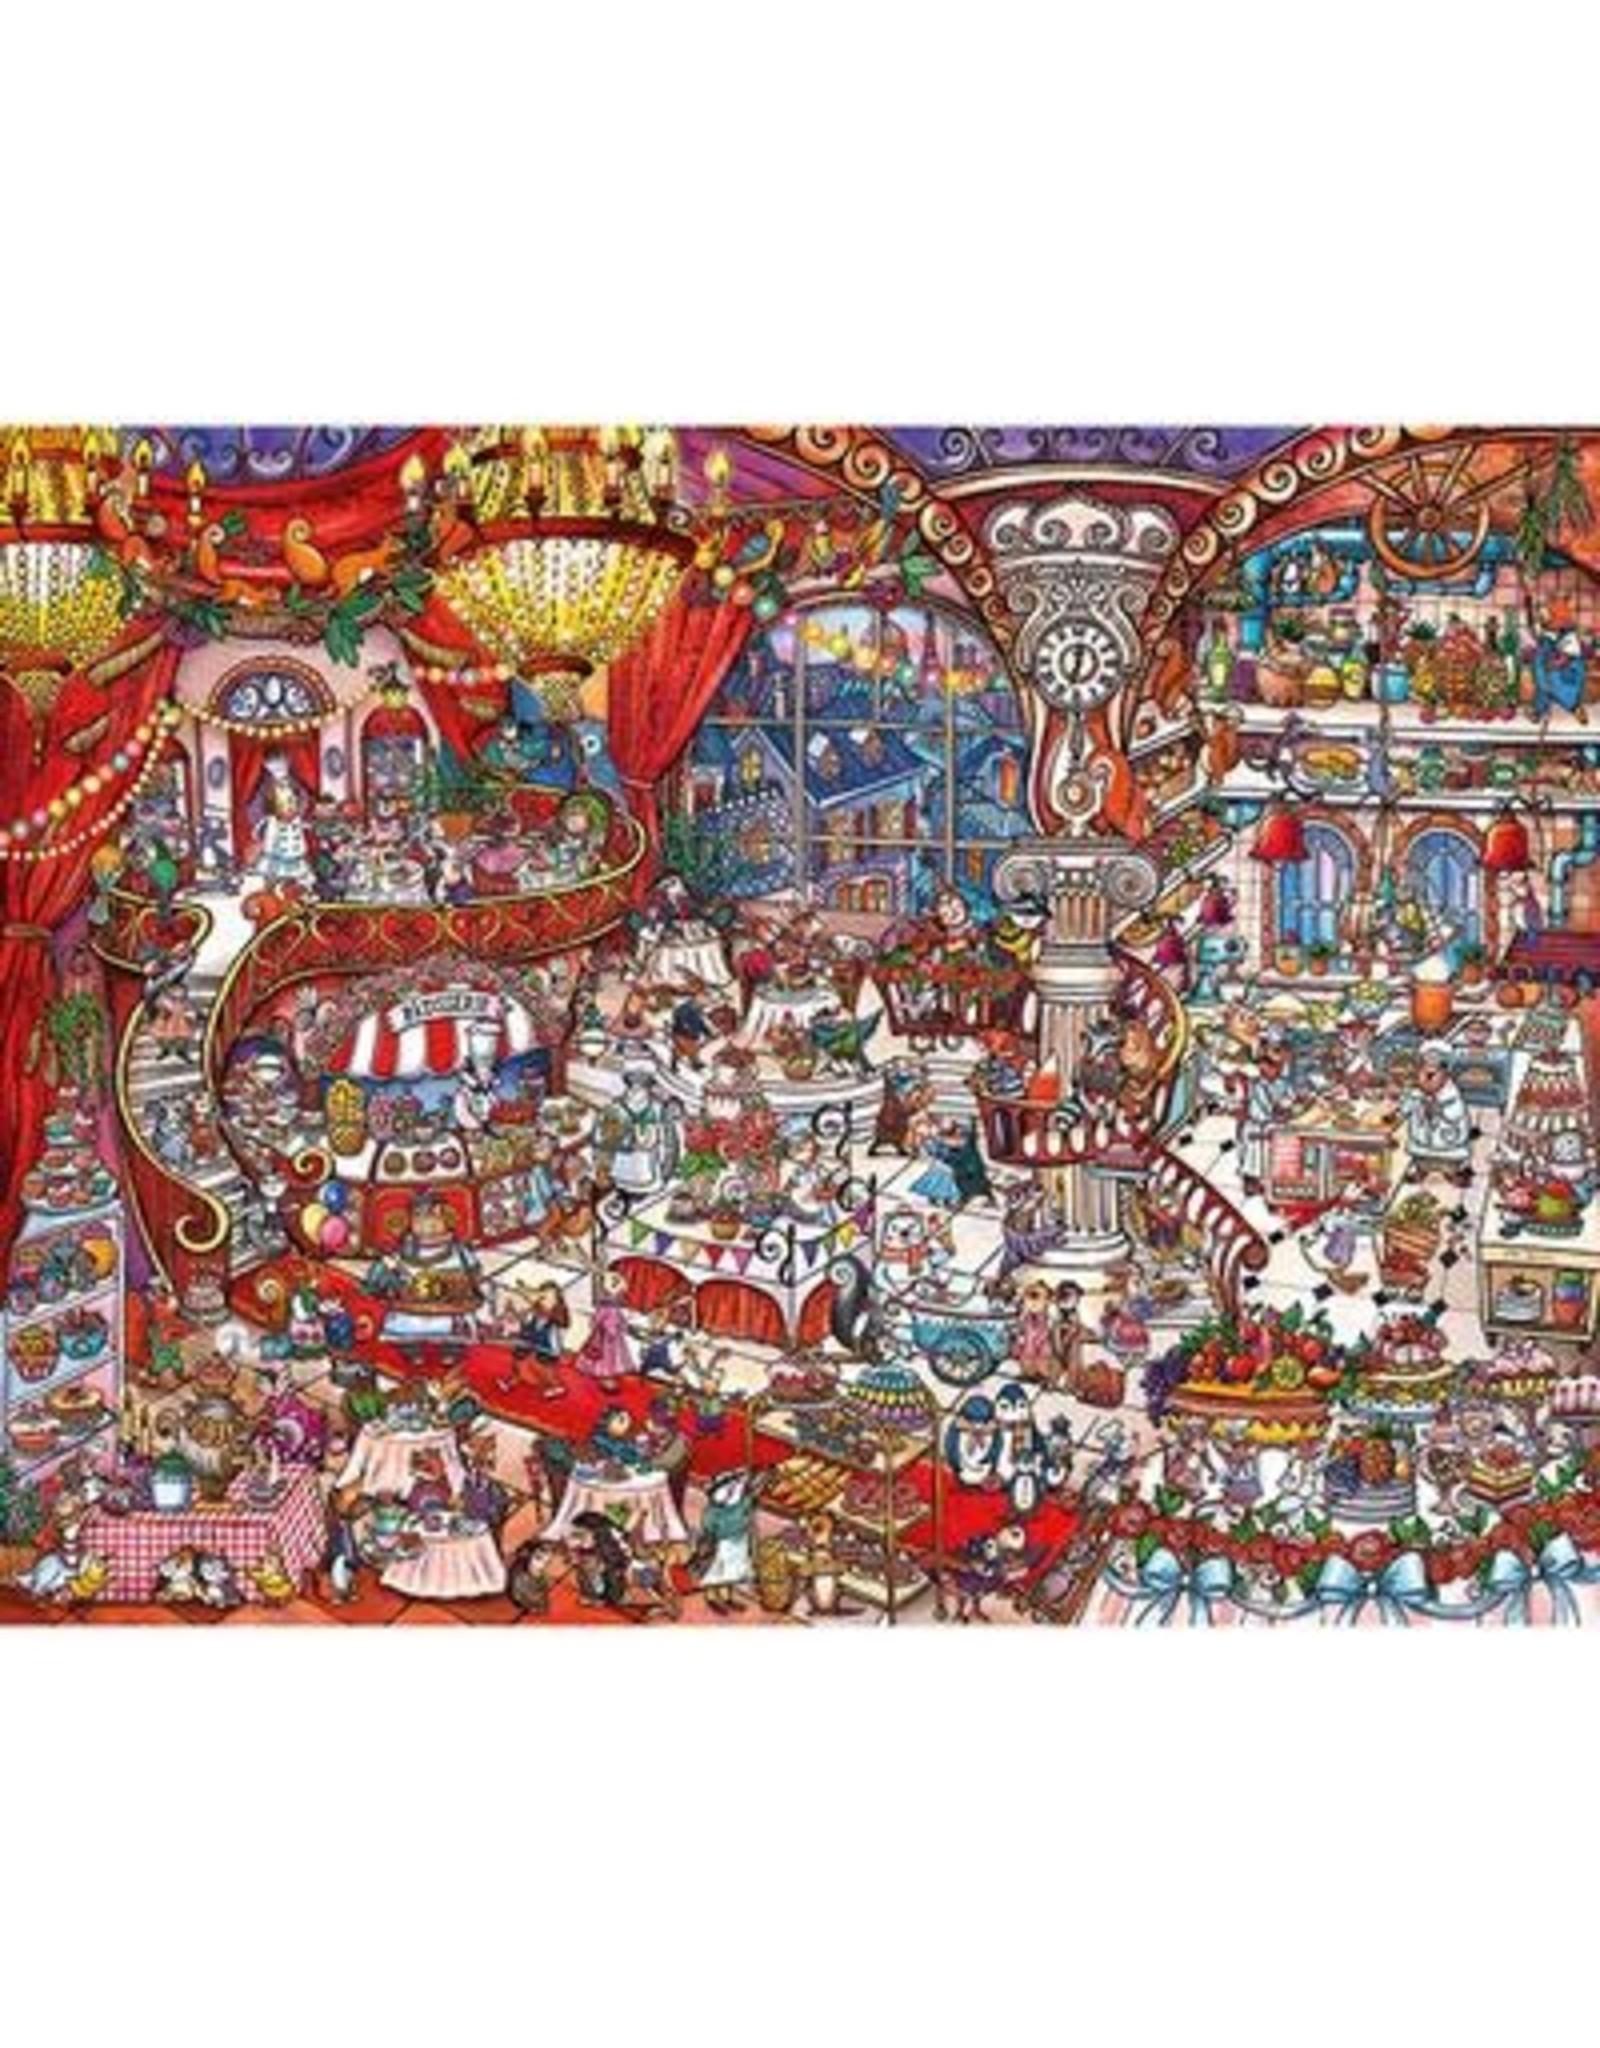 Heye Patisserie 1500pc Puzzle